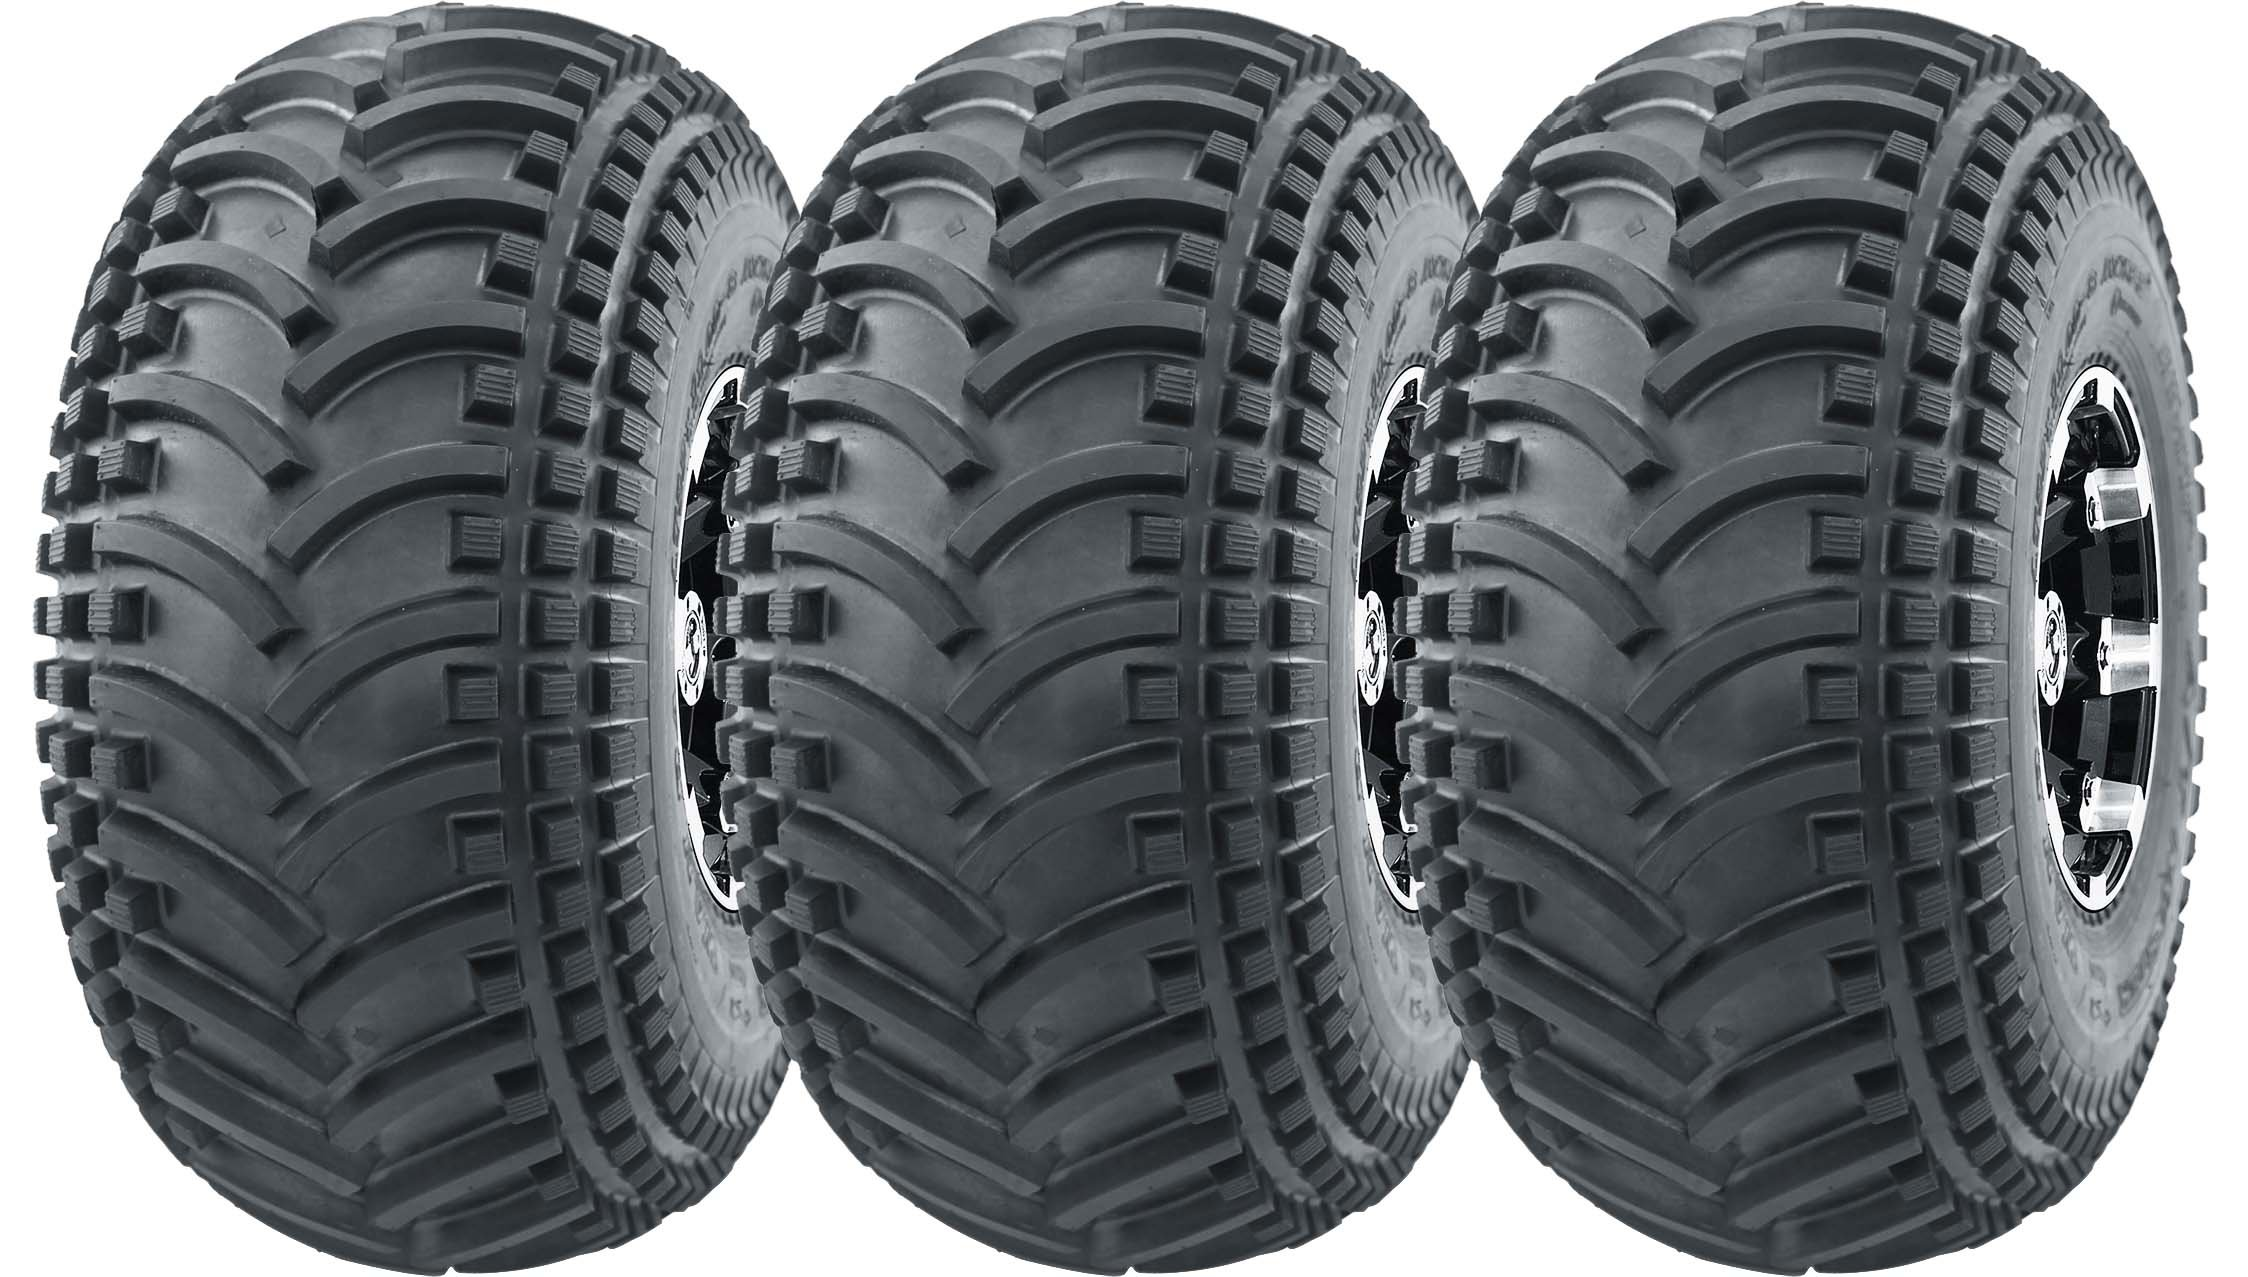 3 New 3 Wheeler WANDA ATV Tires 22X11-8 22x11x8 4PR - 10135